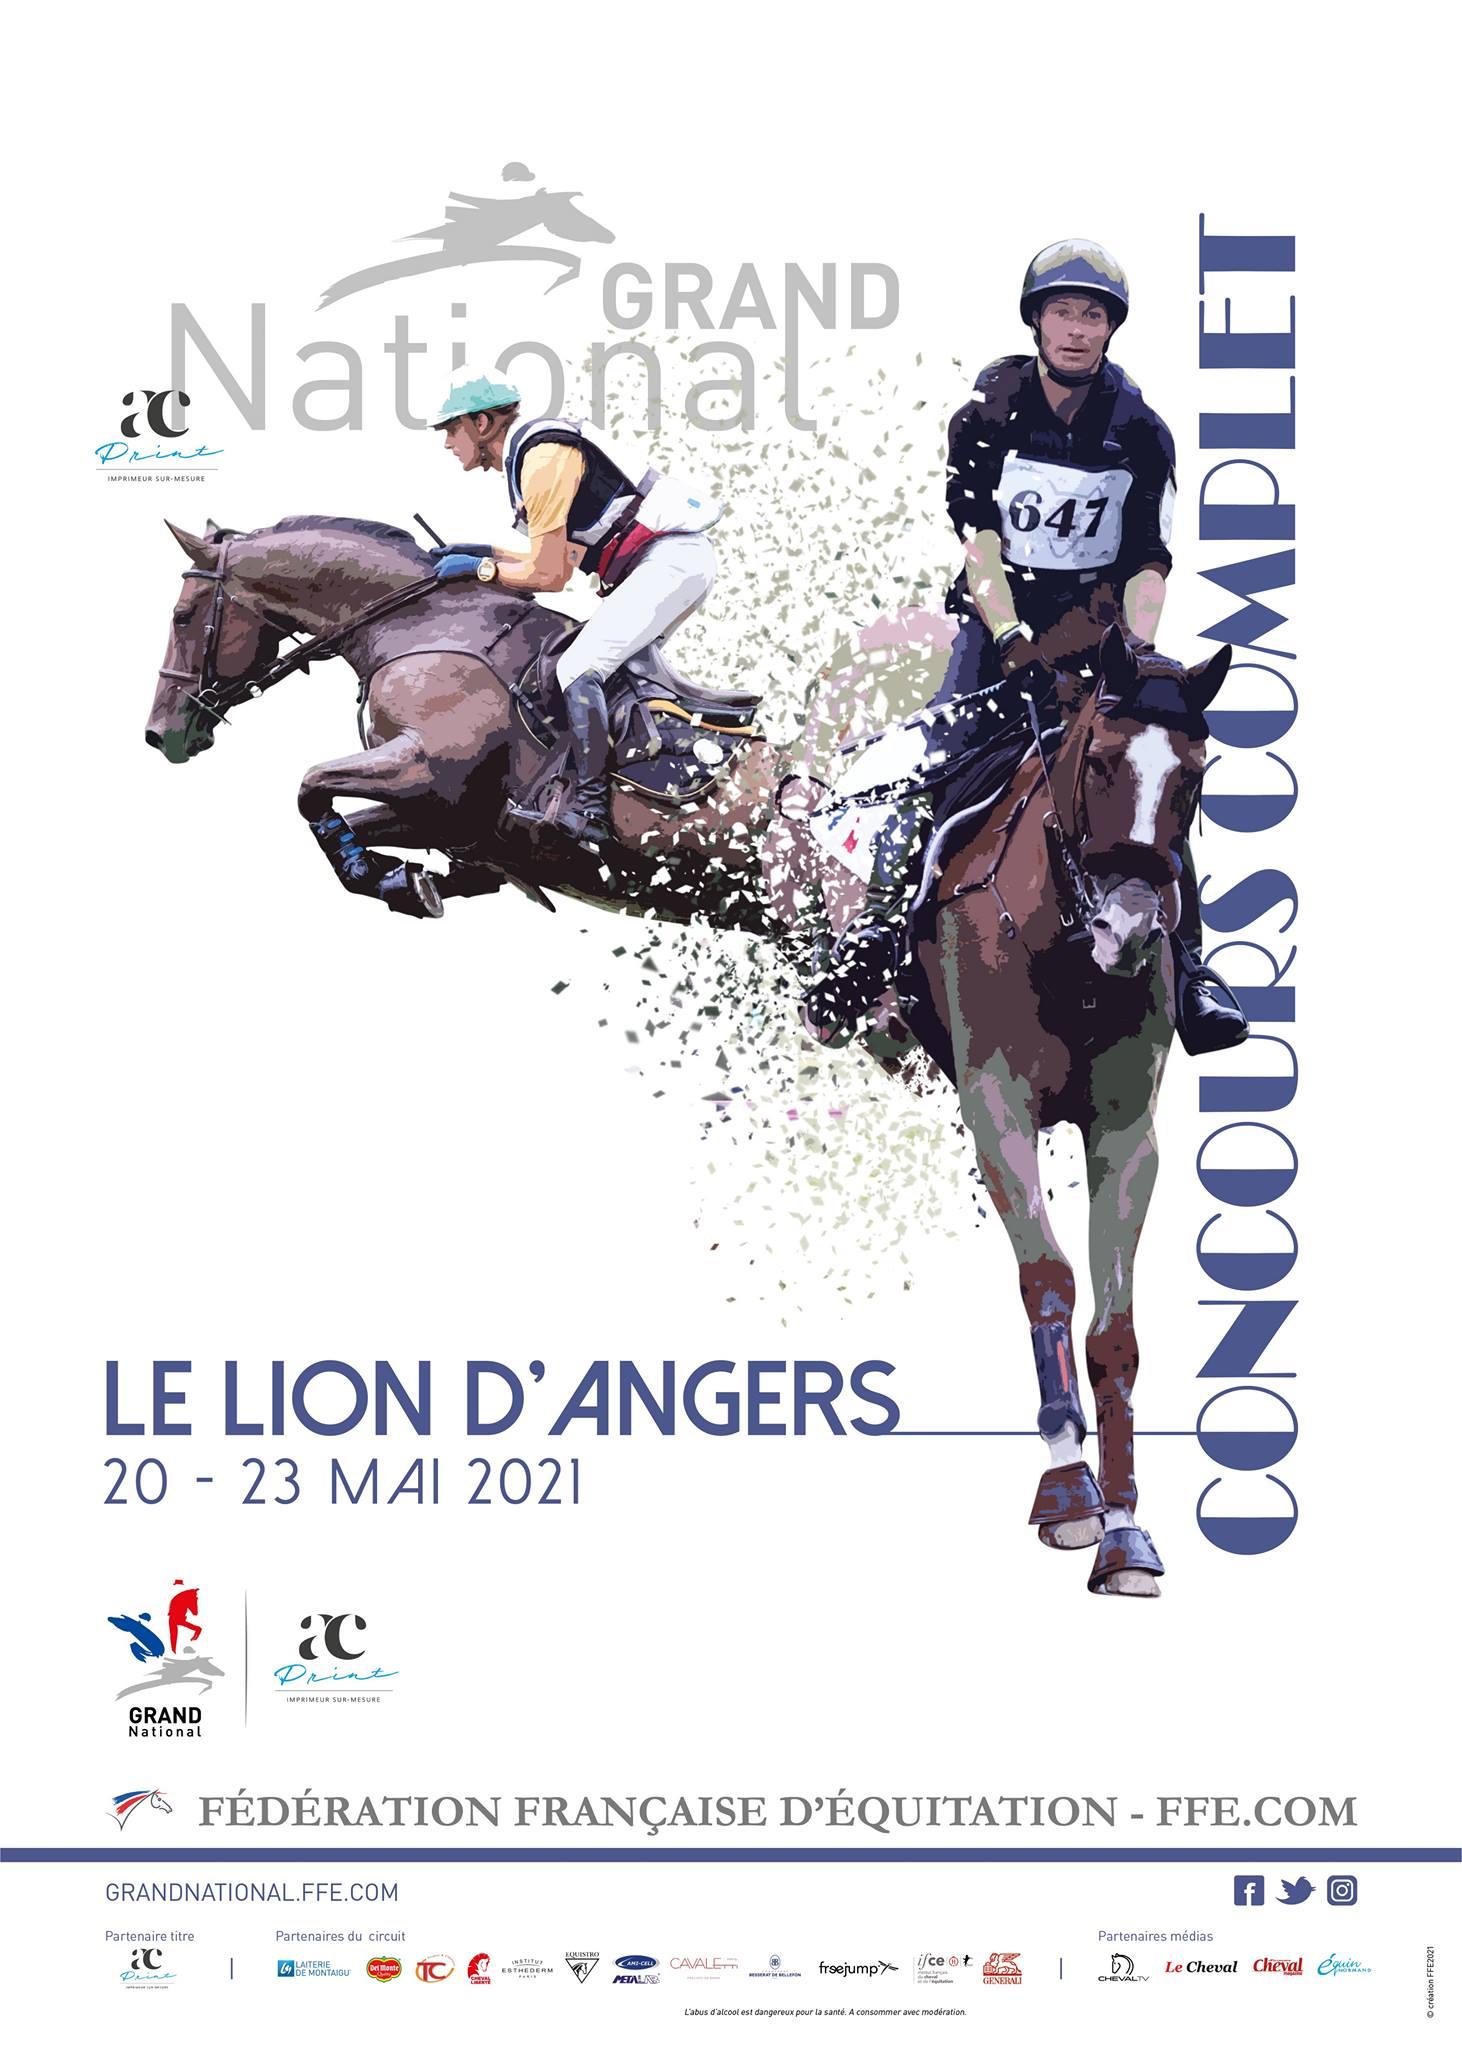 Grand National FFE - AC Print  Concours Complet au Lion d'Angers